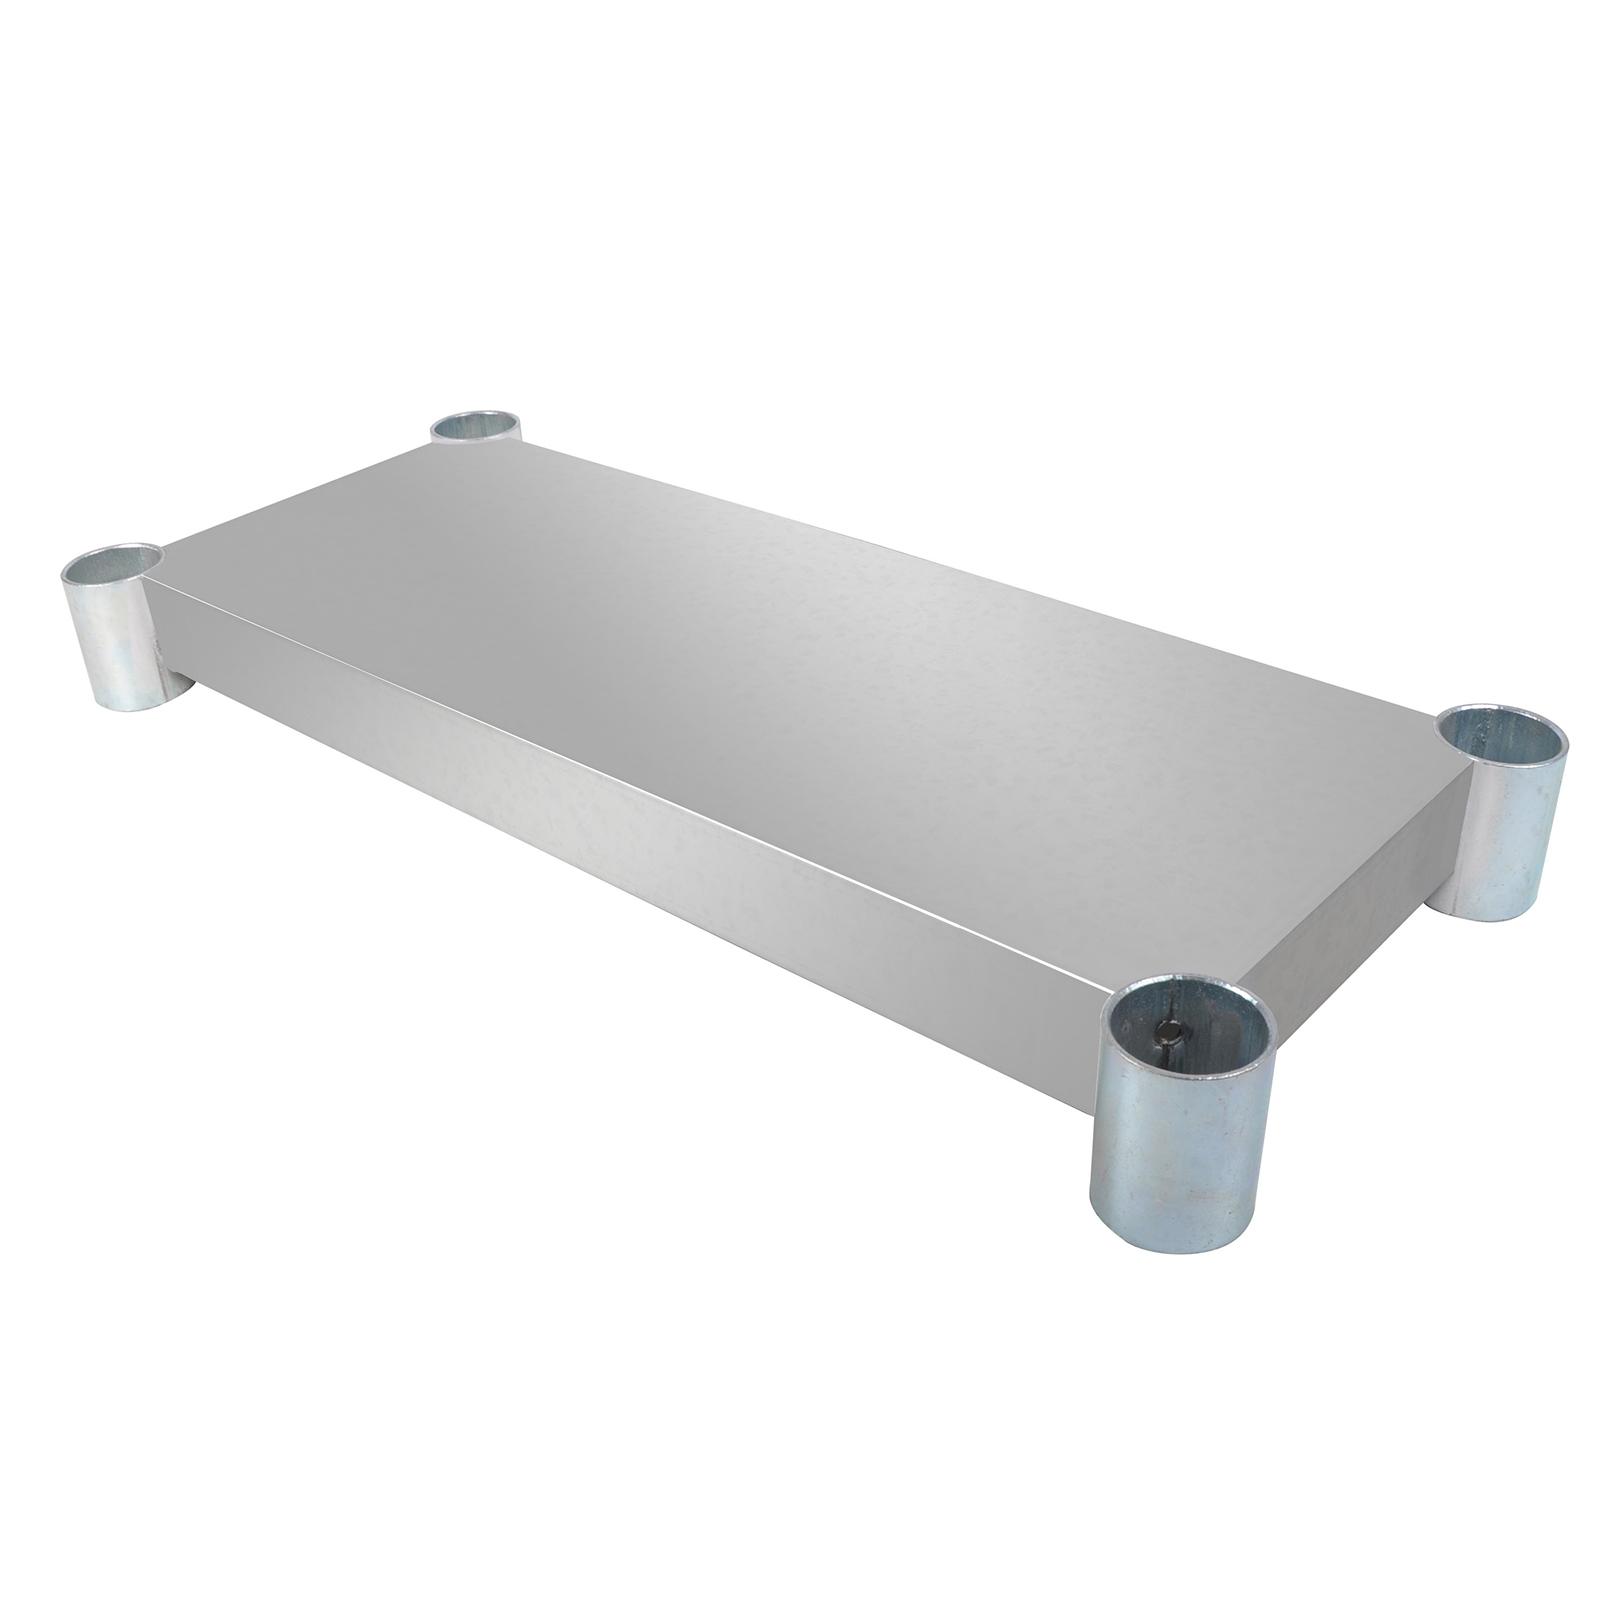 BK Resources SVTS-1896 work table, undershelf